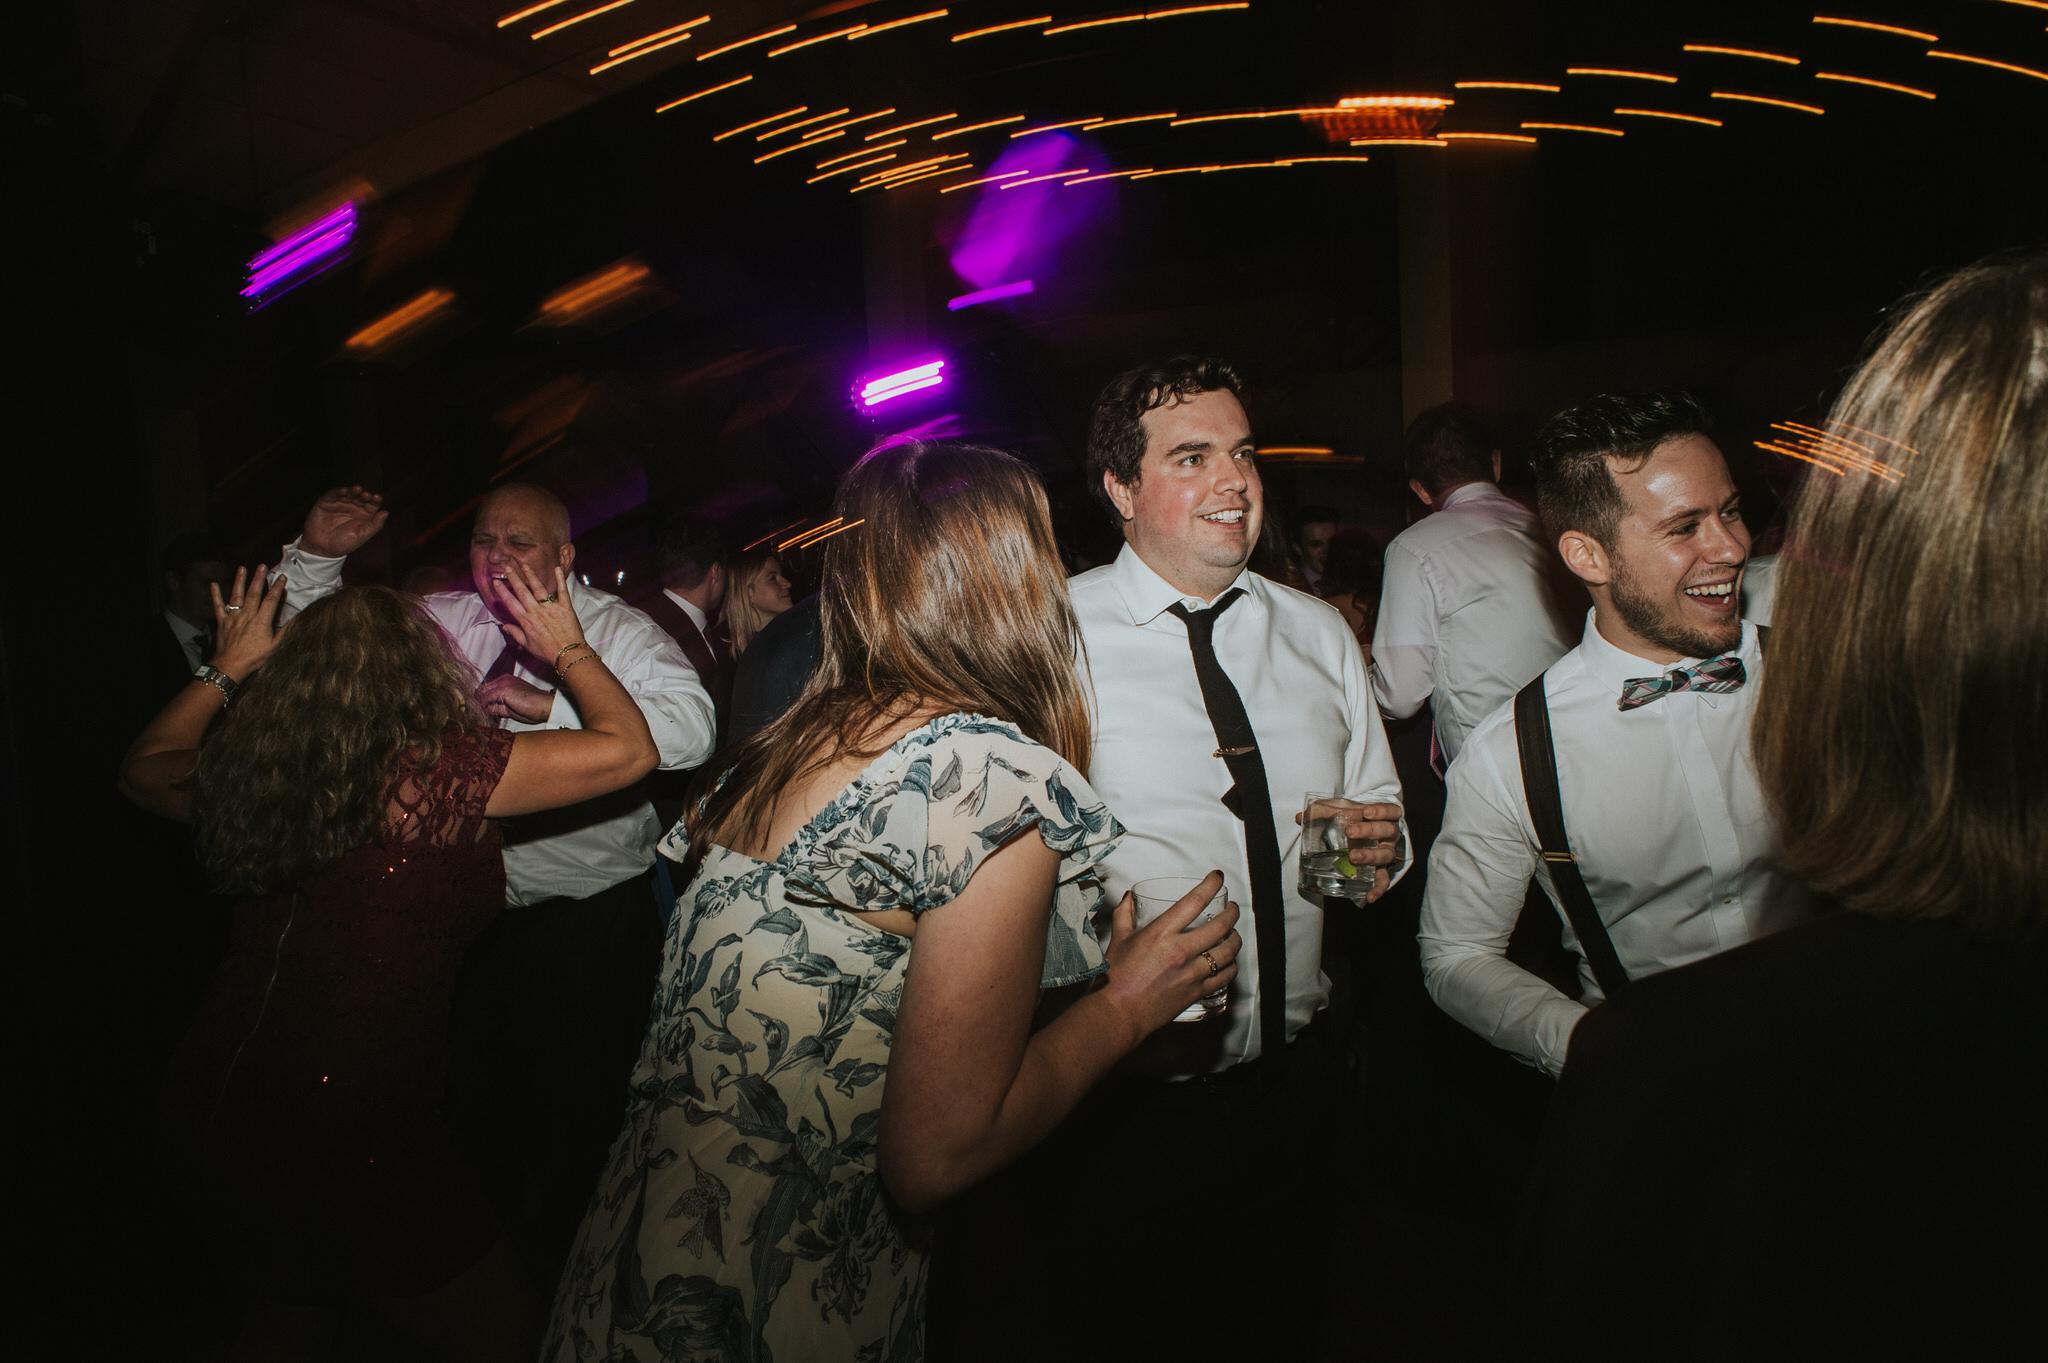 scarletoneillphotography_weddingphotography_prince edward county weddings208.JPG